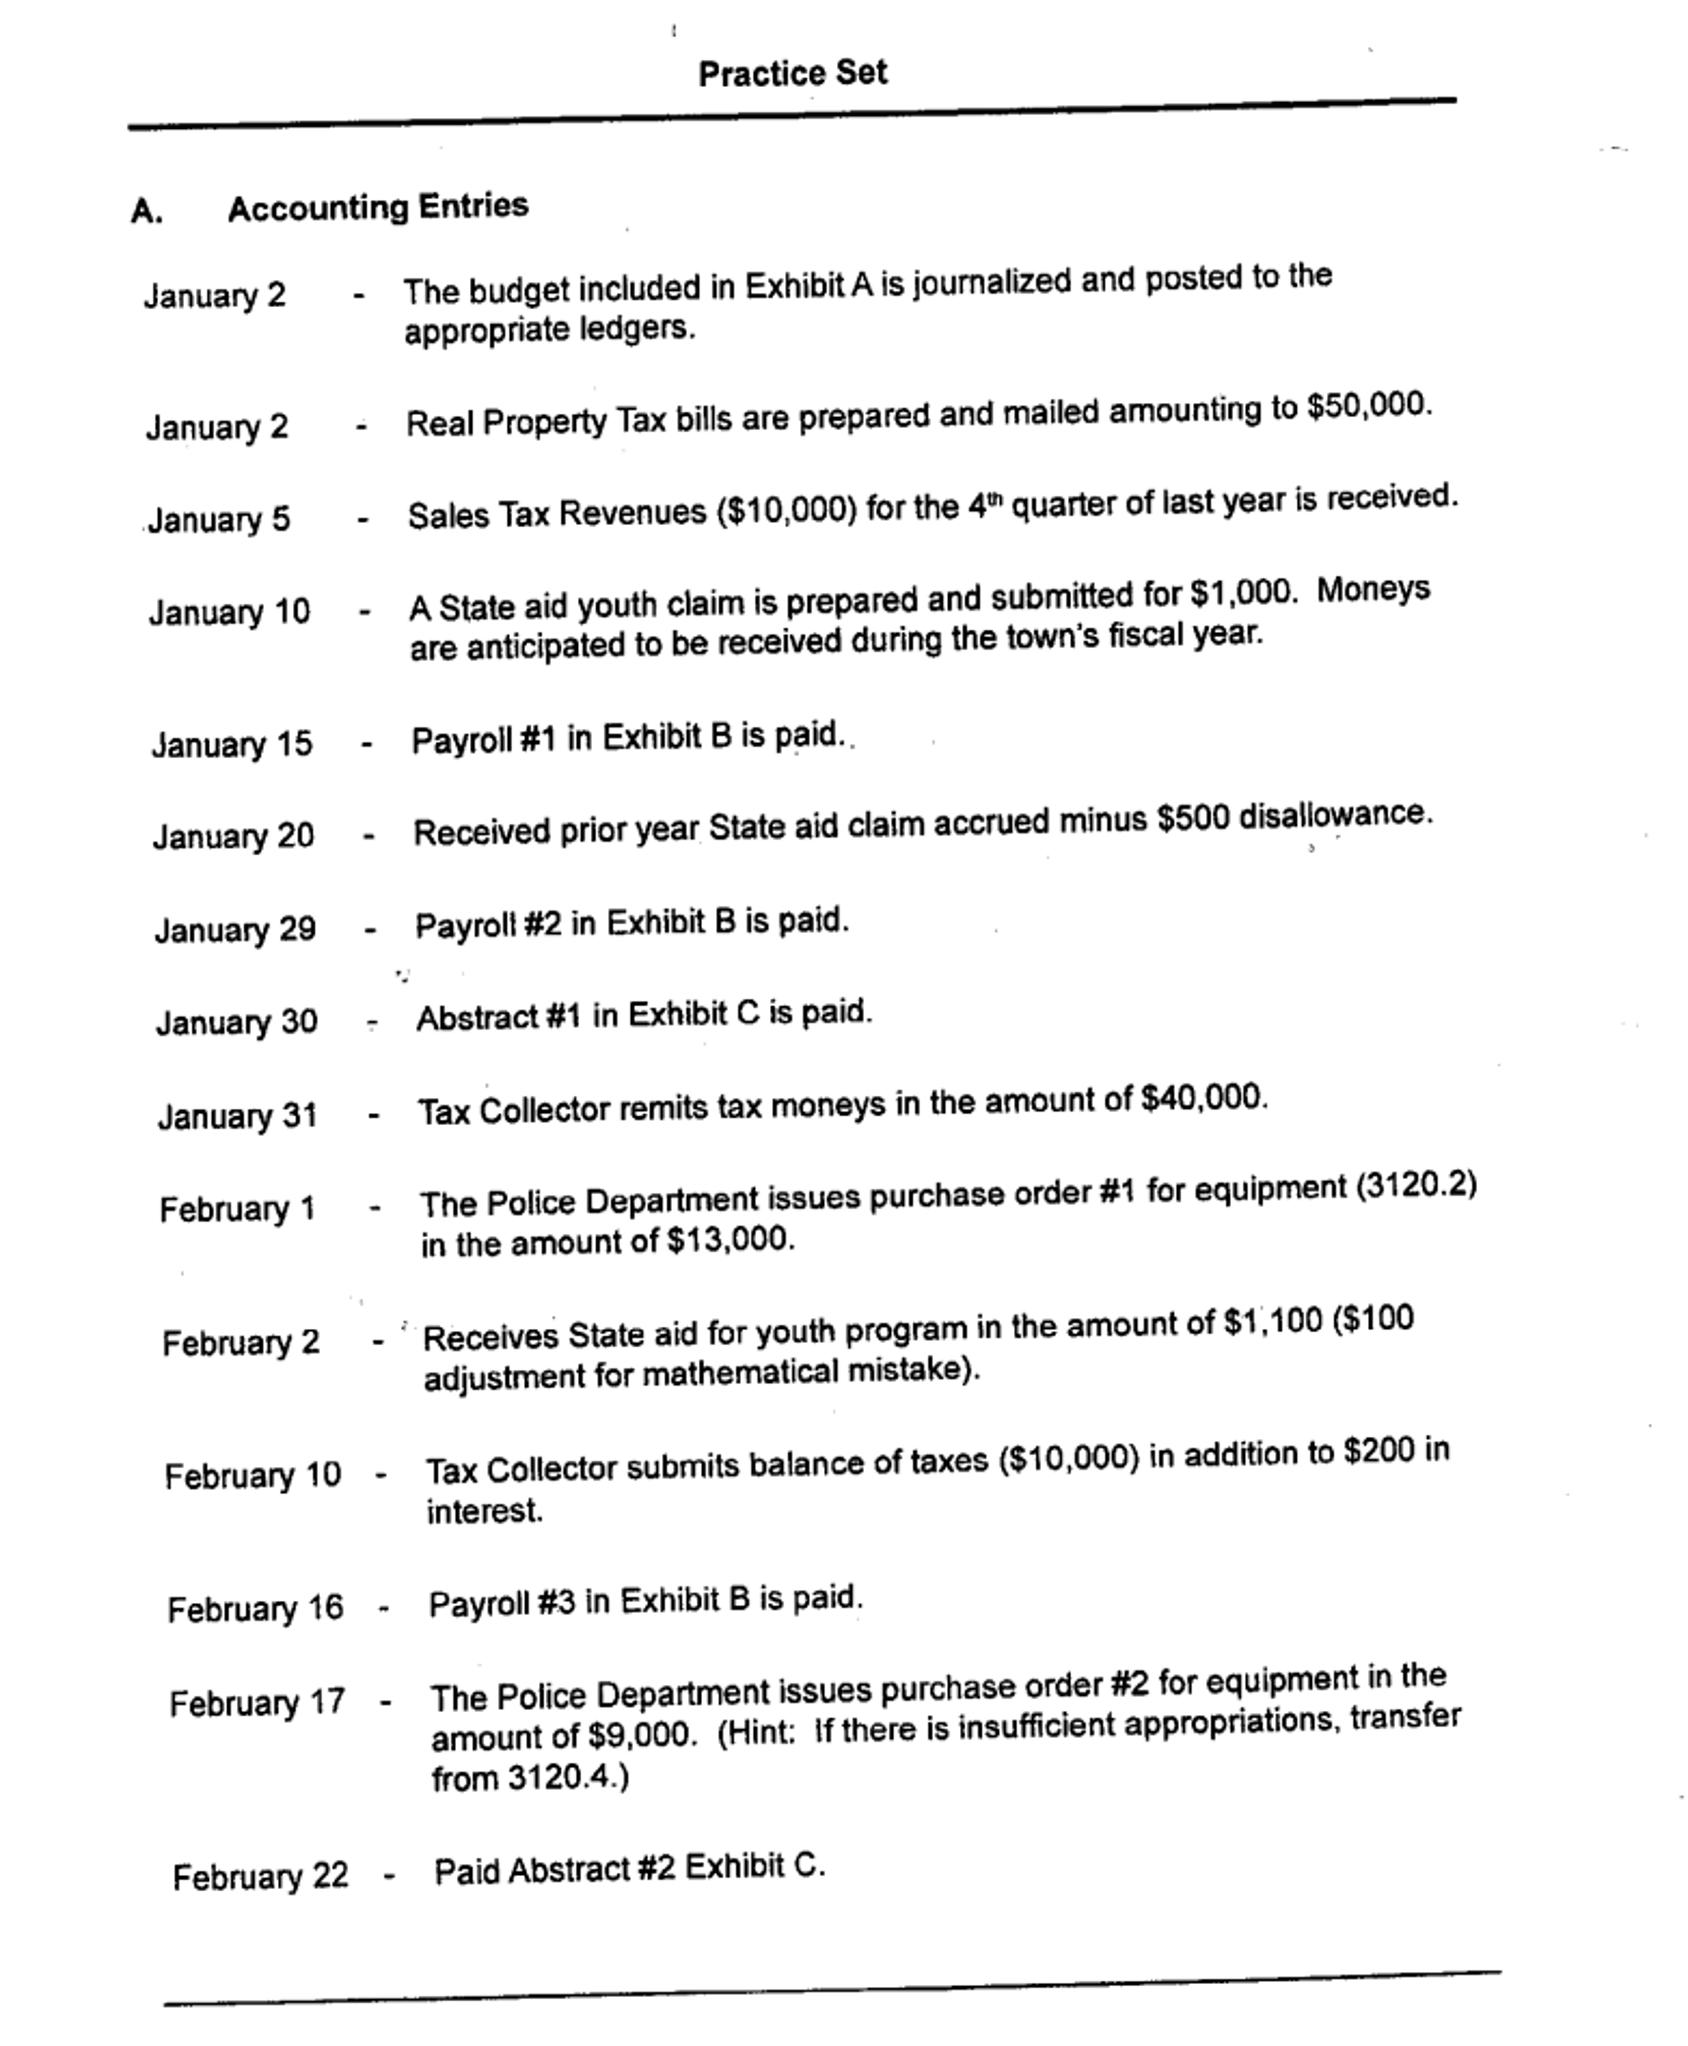 General Fund-General Ledger Account Codes Only Par